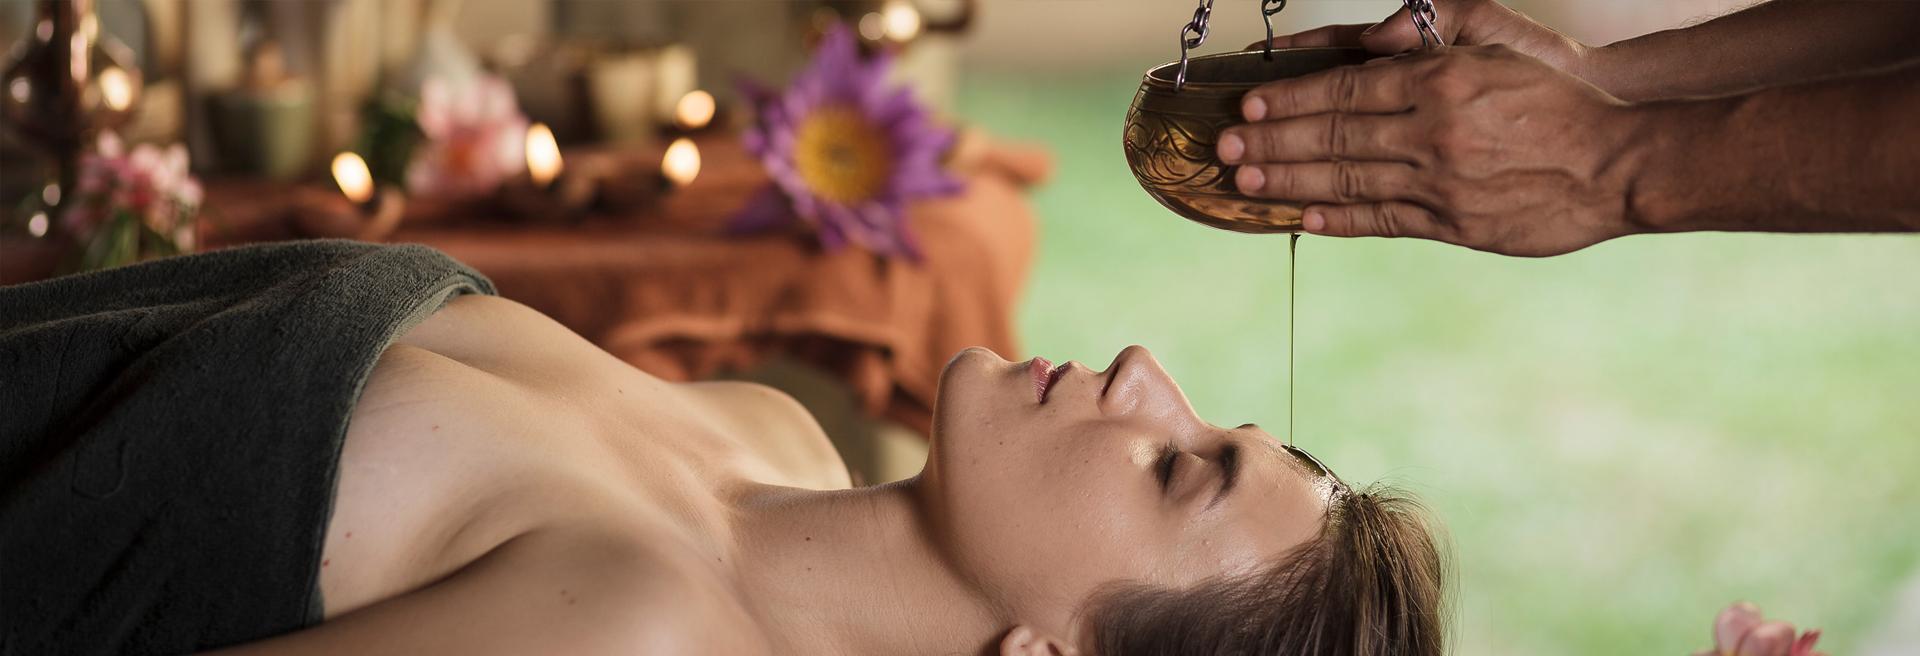 Massages at kanduruketha